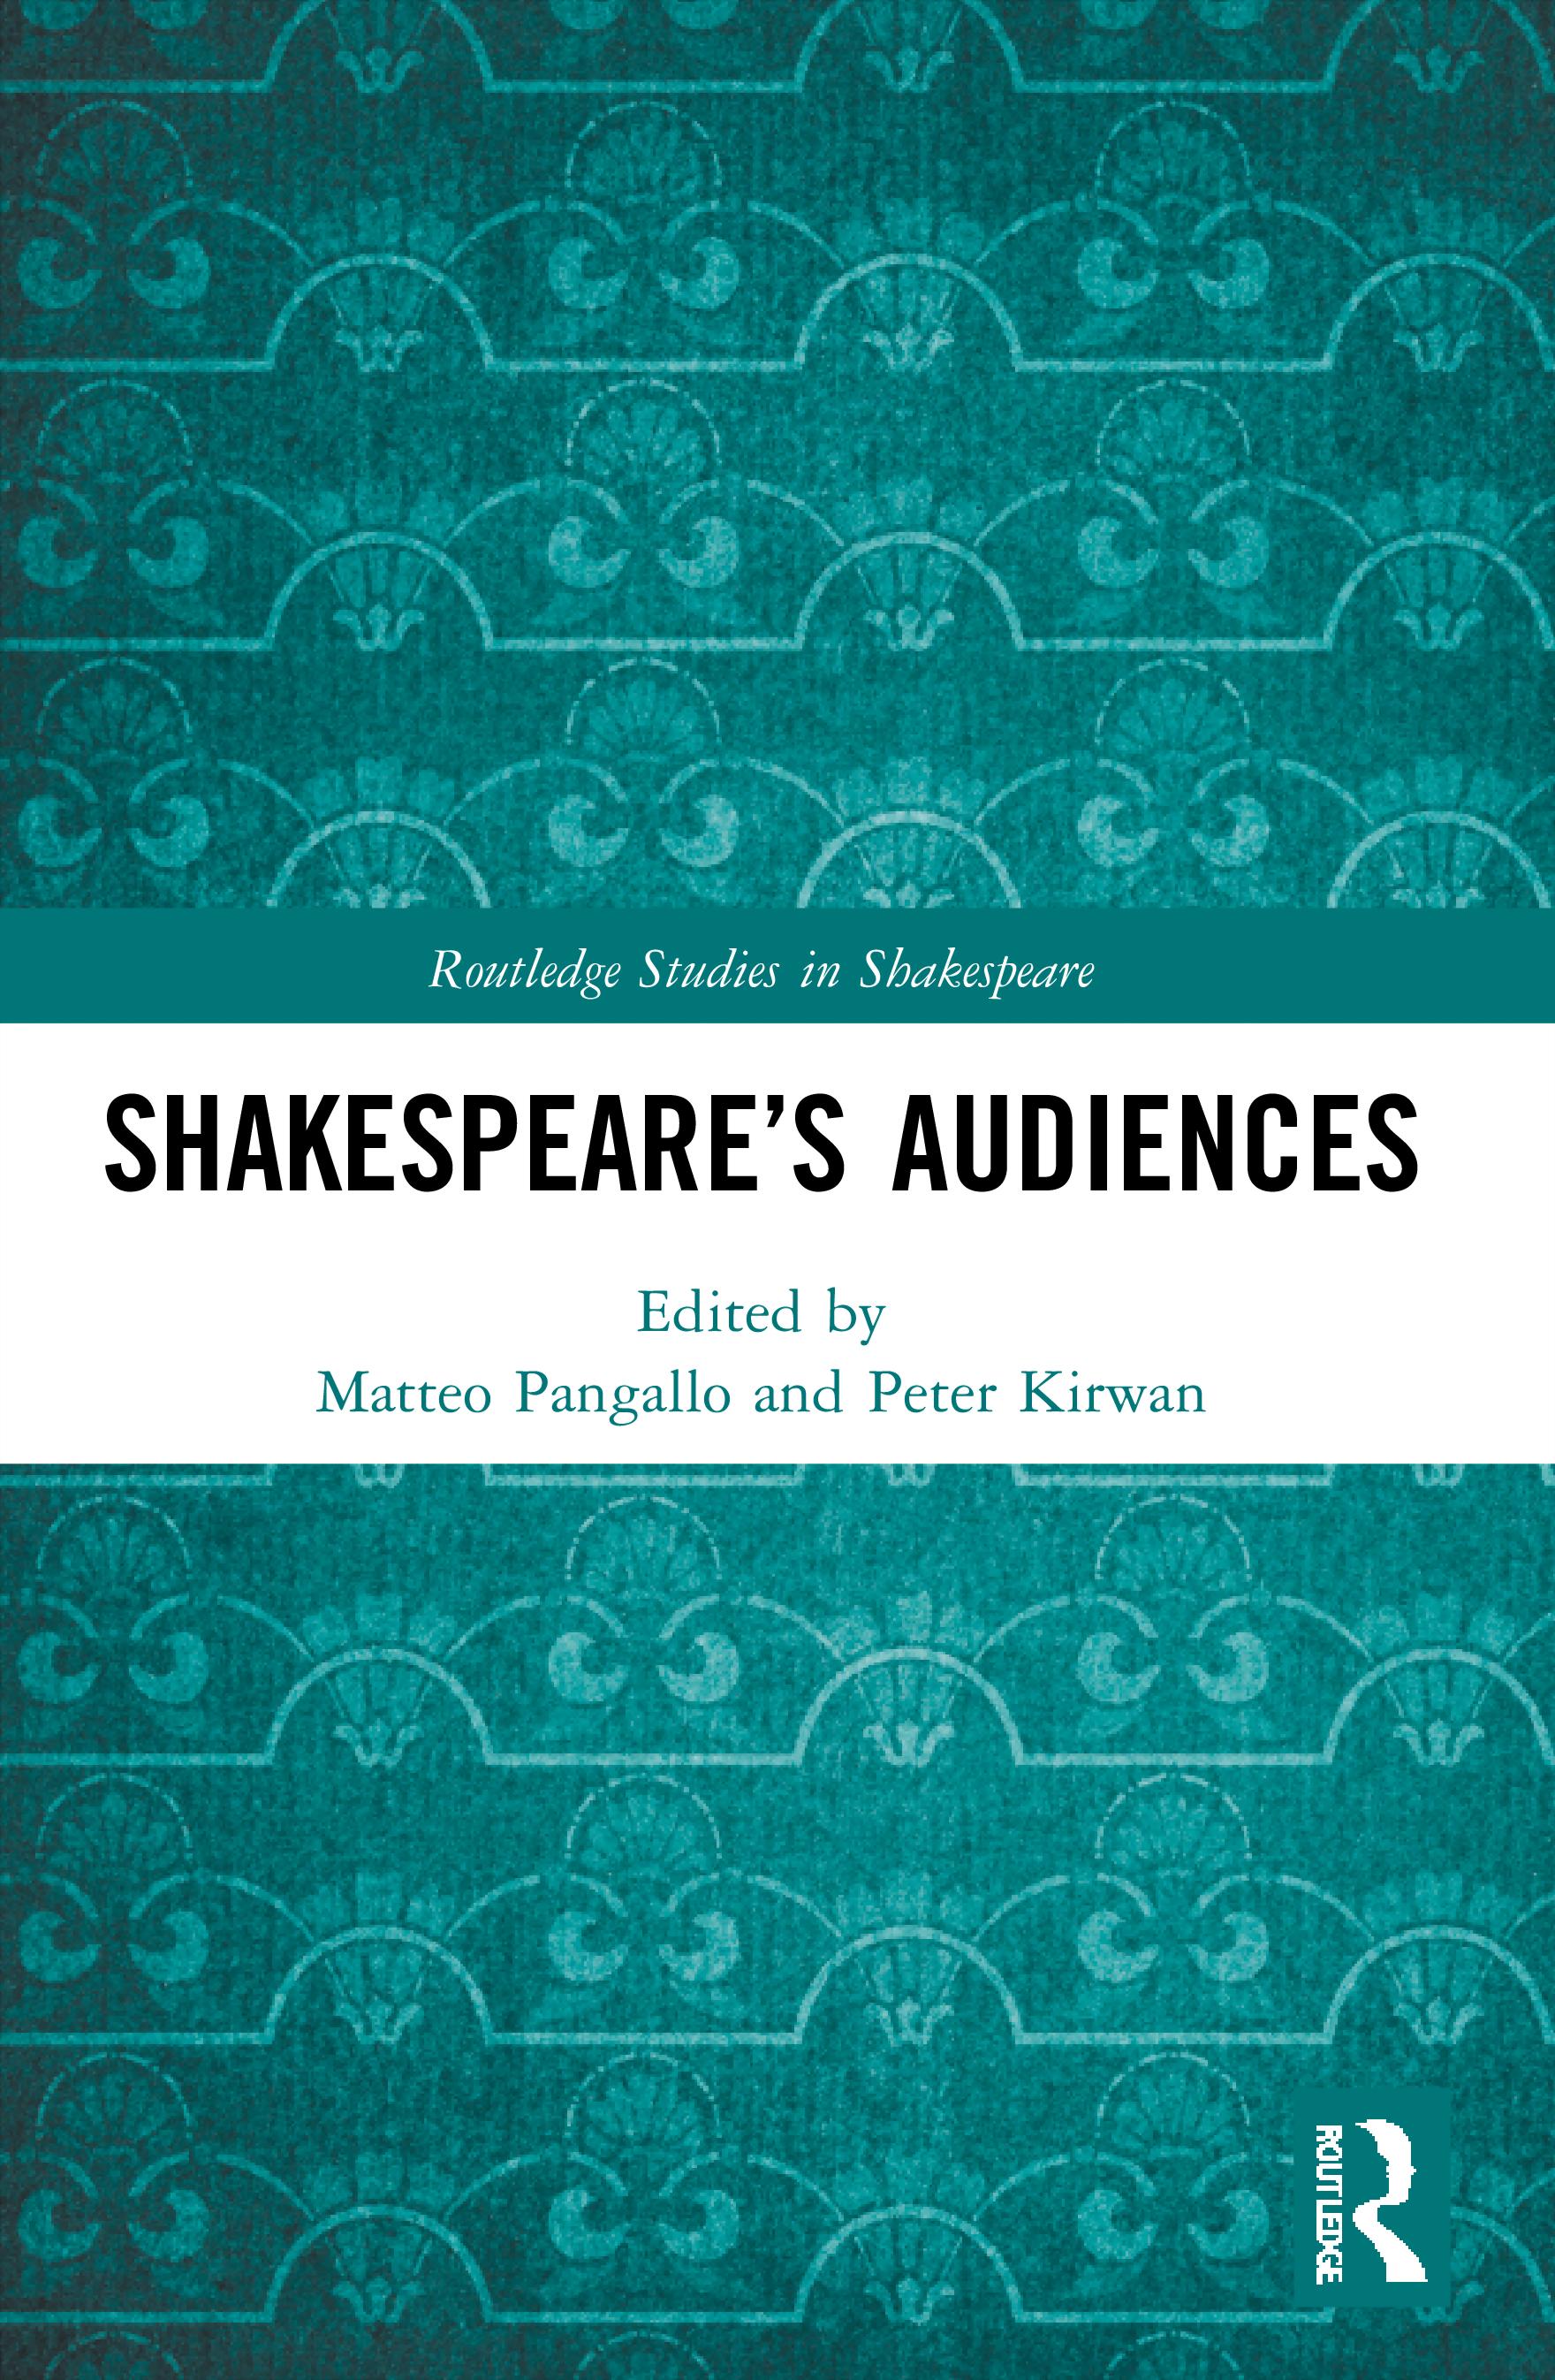 Shakespeare's Audiences